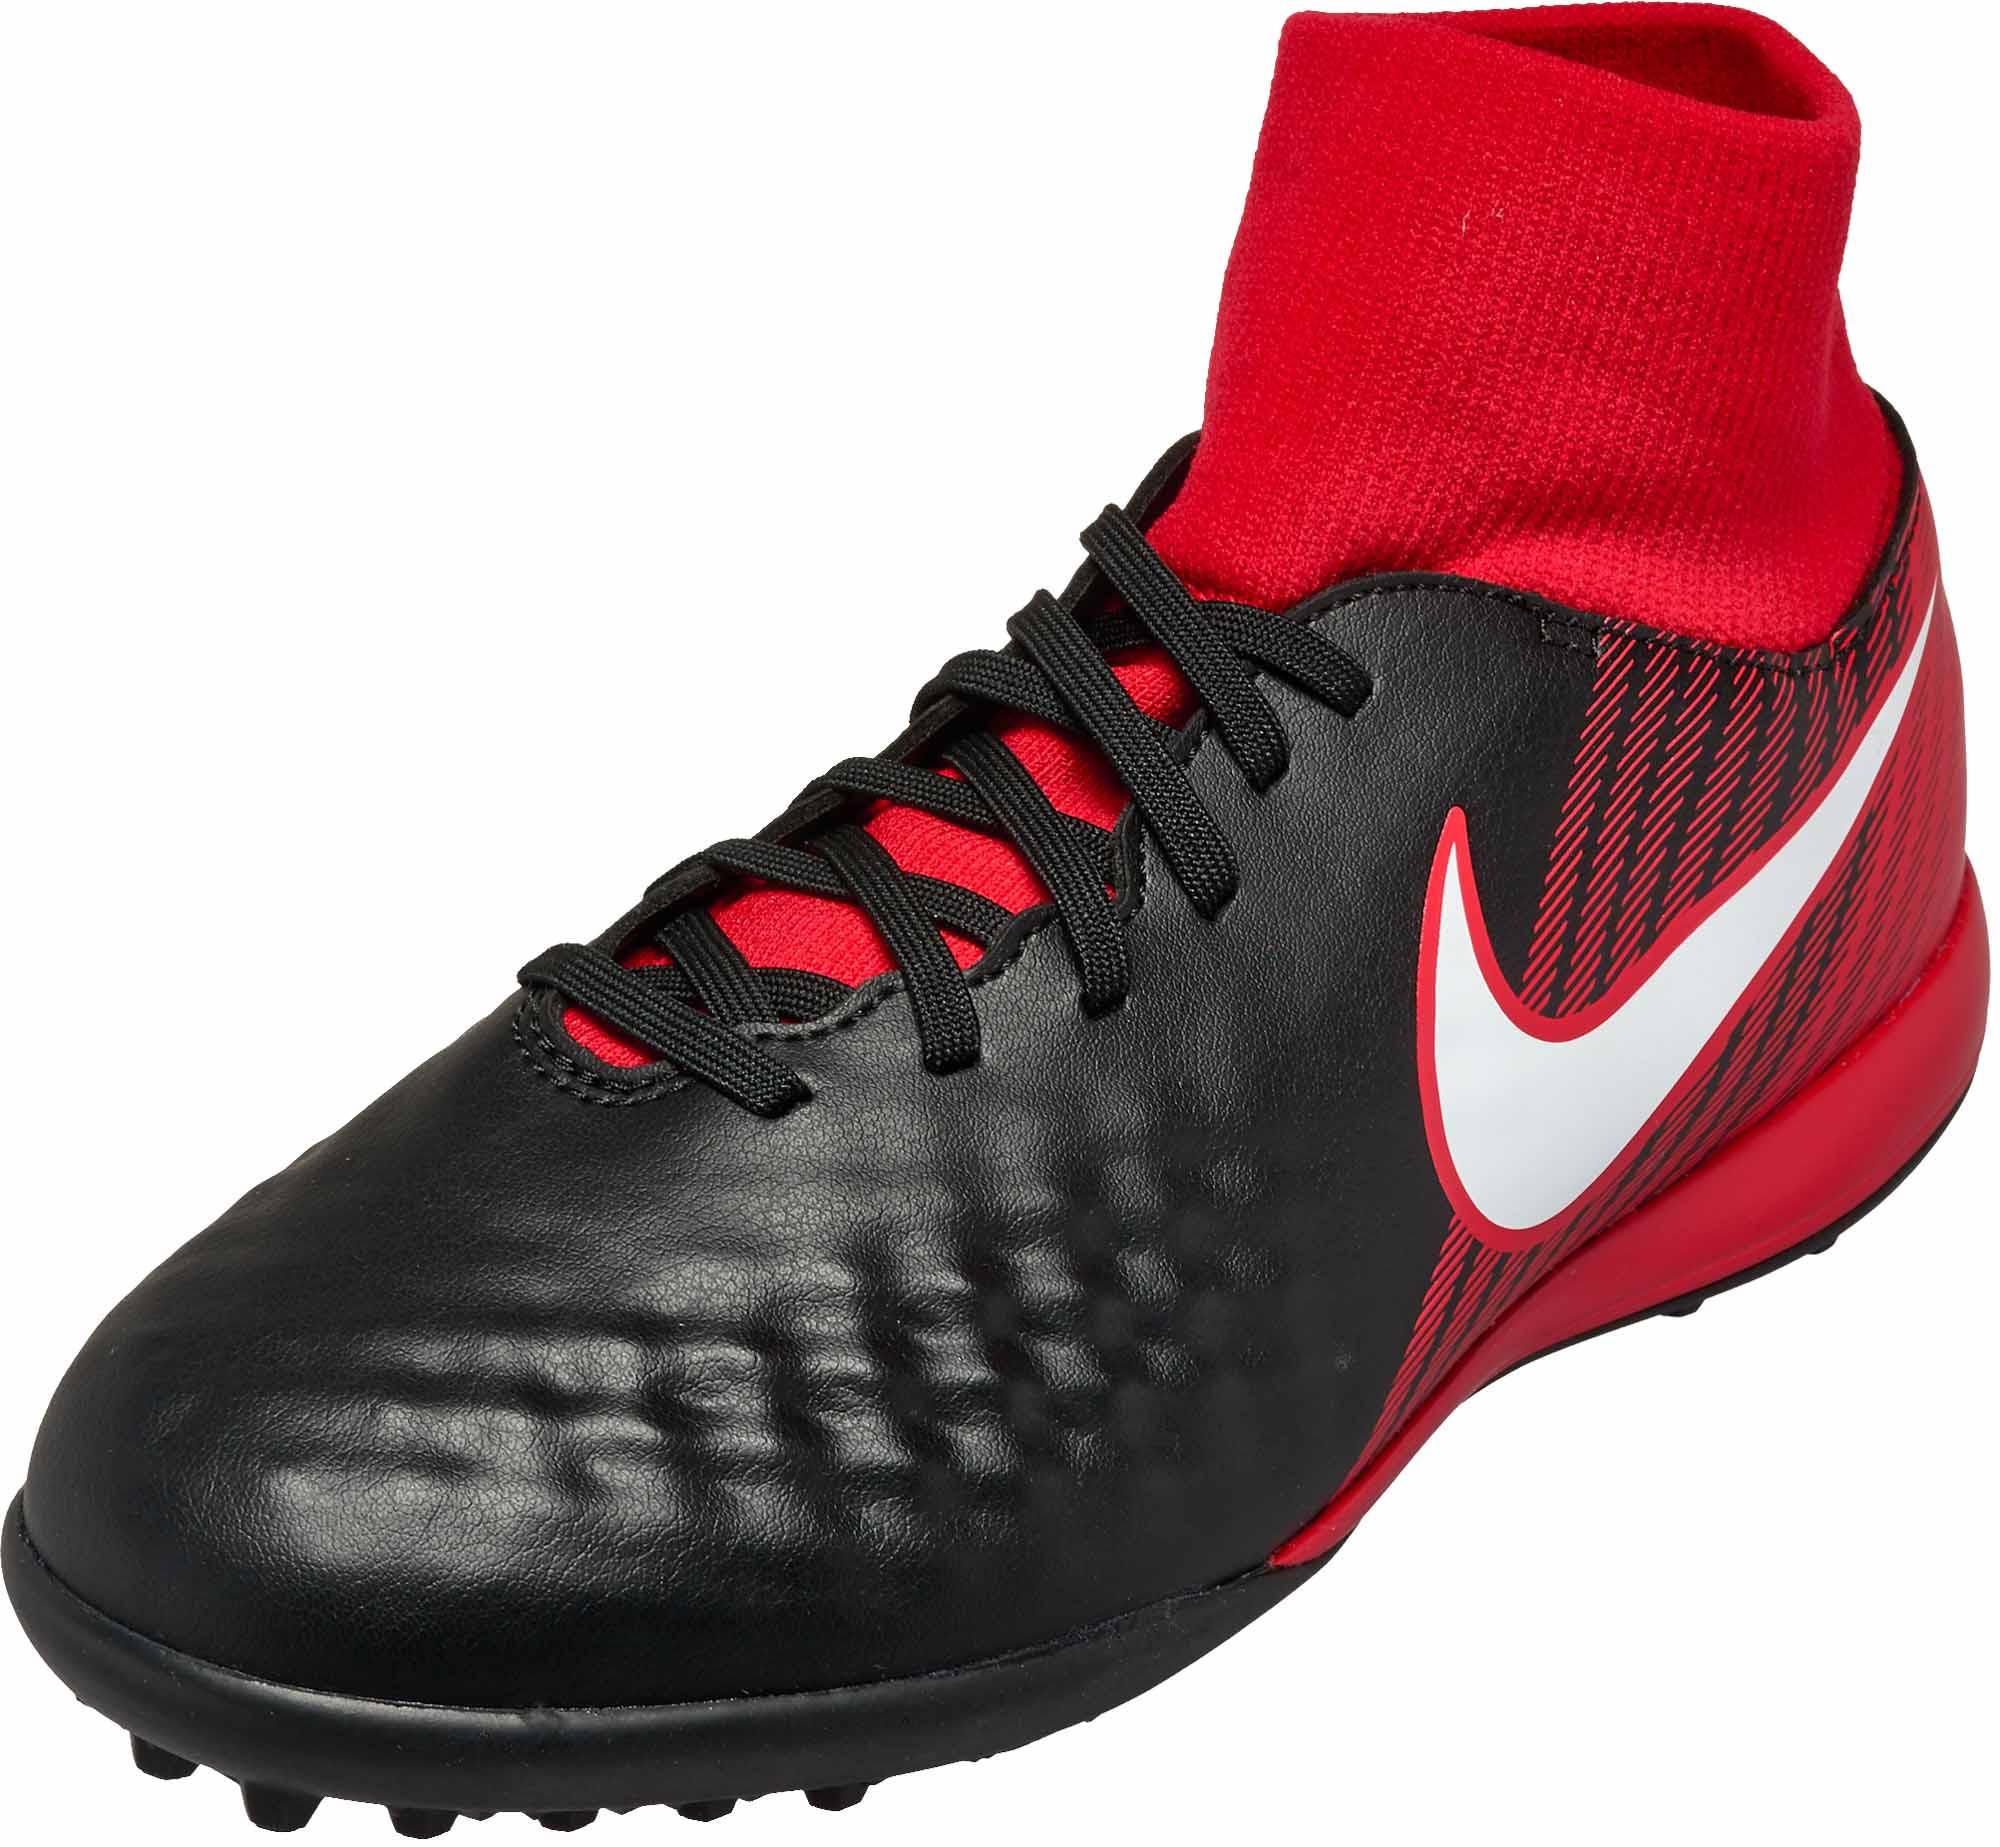 0b8c1ad06aeb0 Nike Kids MagistaX Onda II DF TF – Black/White